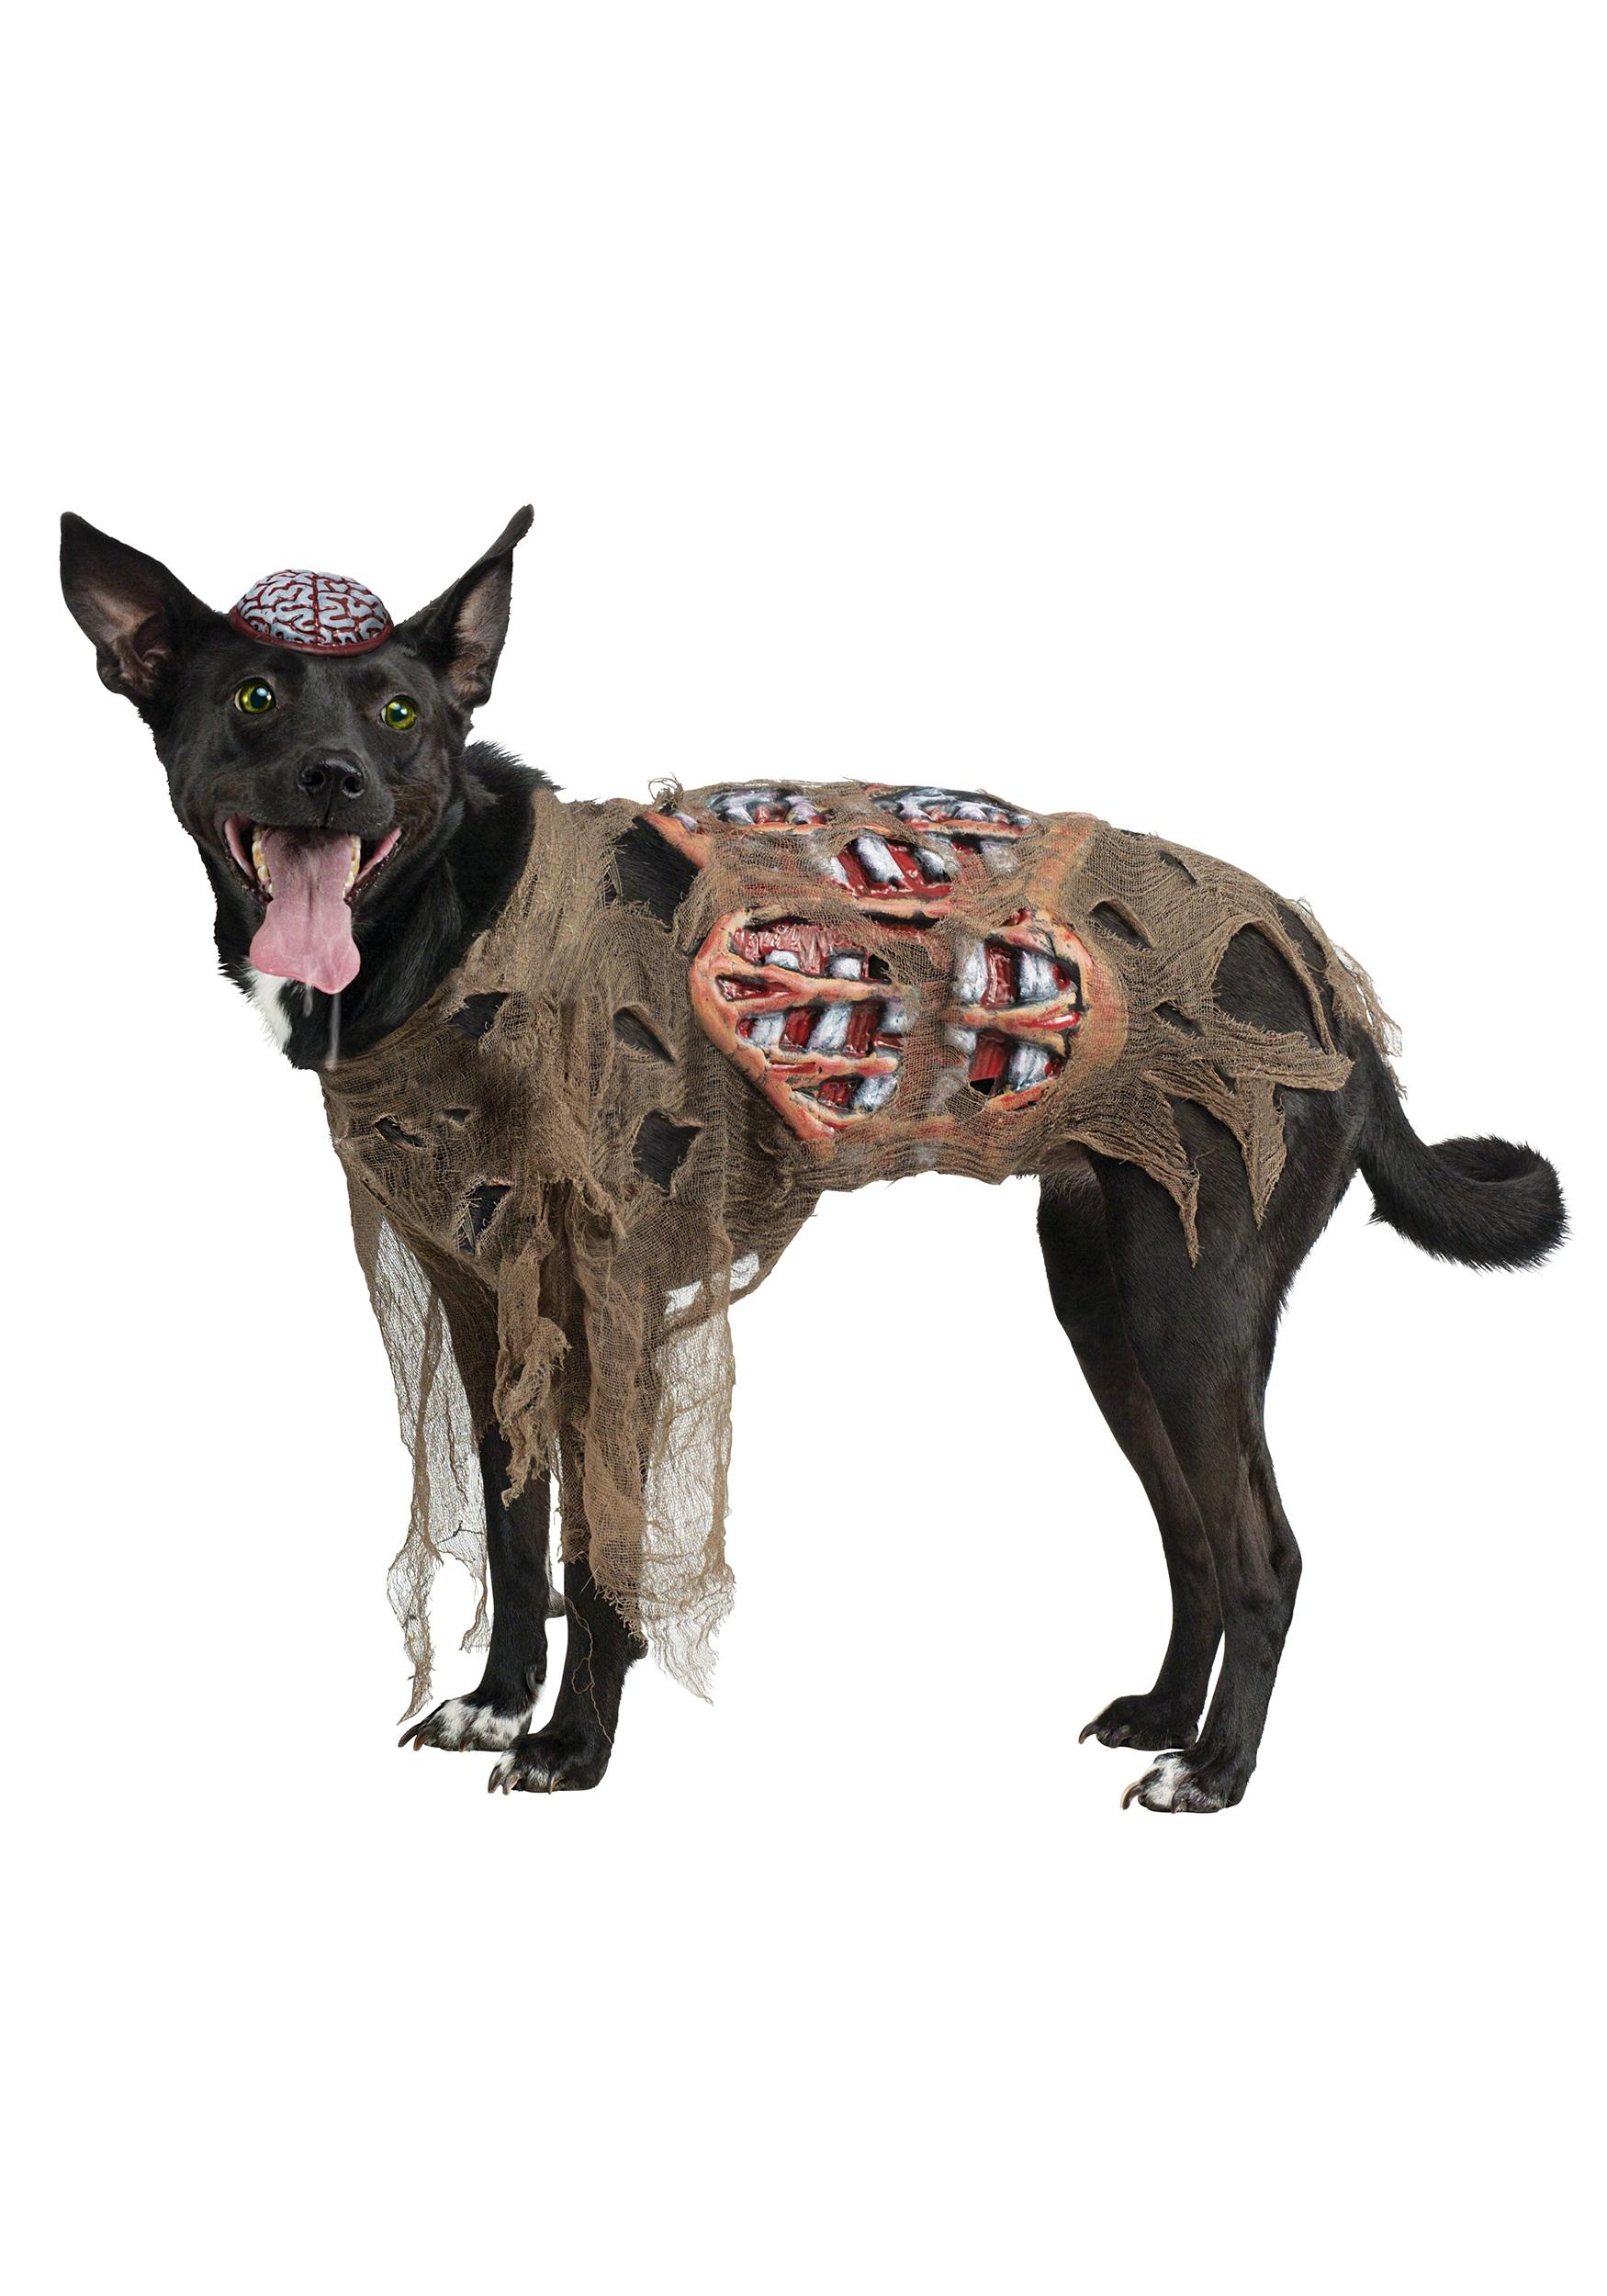 Zombie Dog Costume  sc 1 st  Halloween Costumes & Zombie Dog Costume - Halloween Costumes